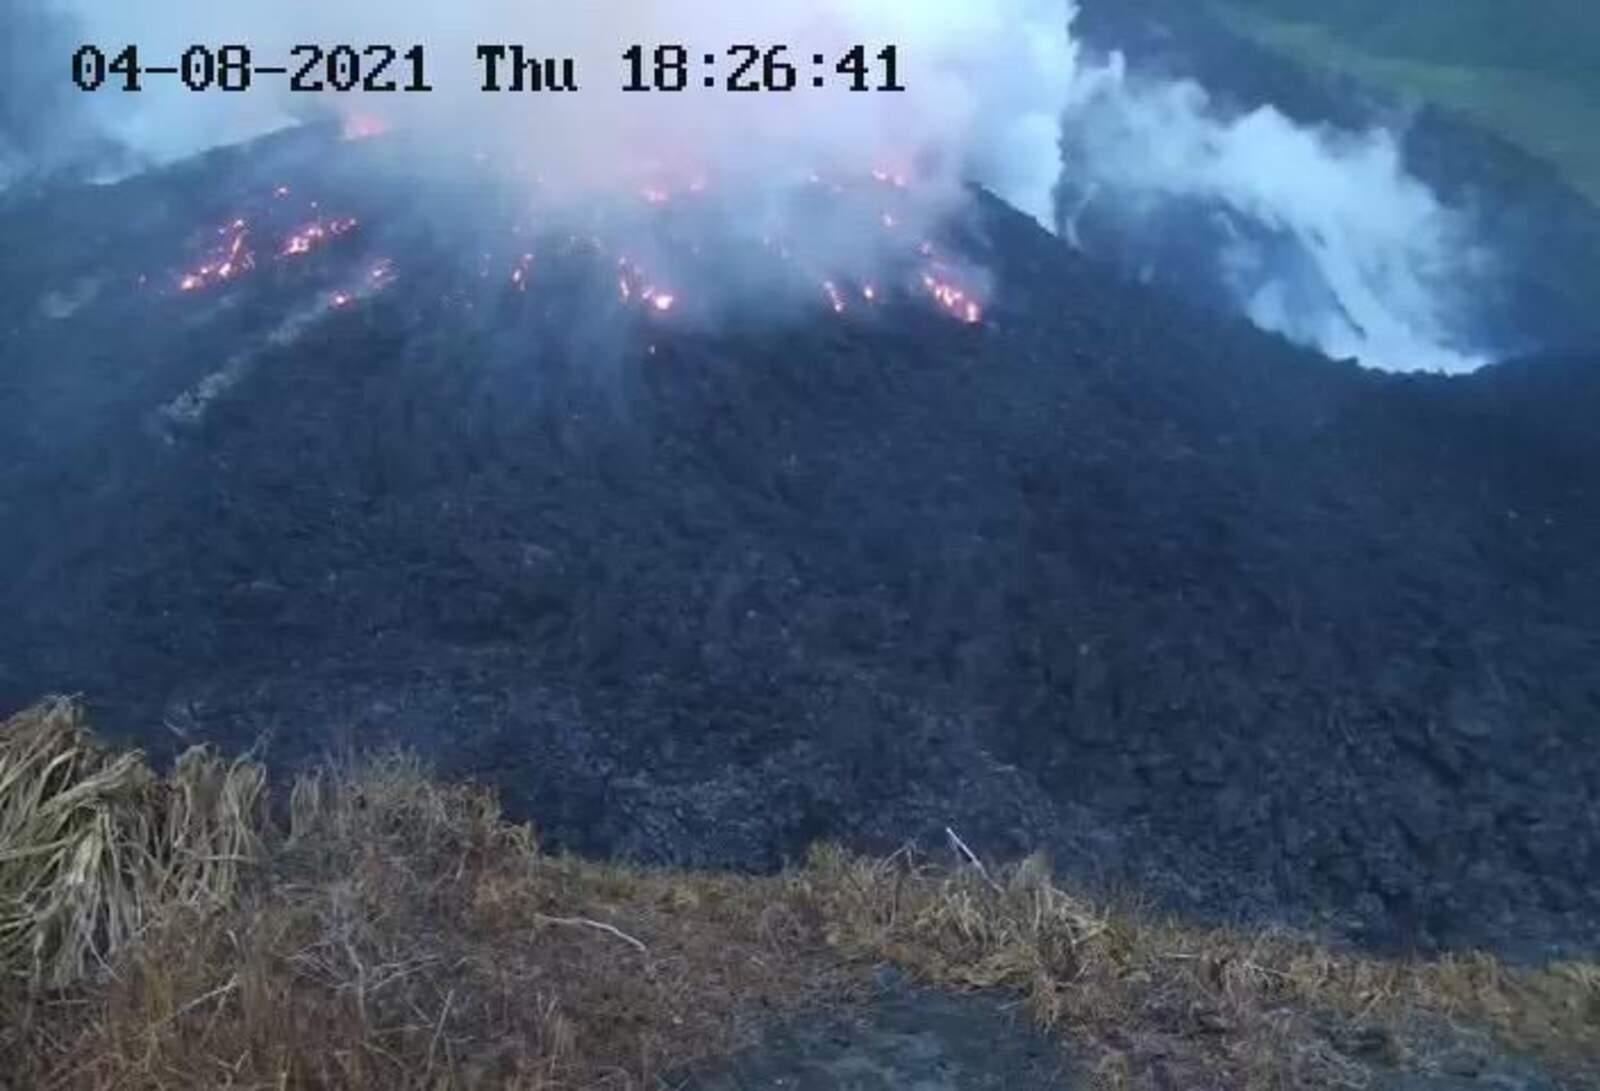 El volcà de La Soufrière, a St. Vincent i les Grenadines